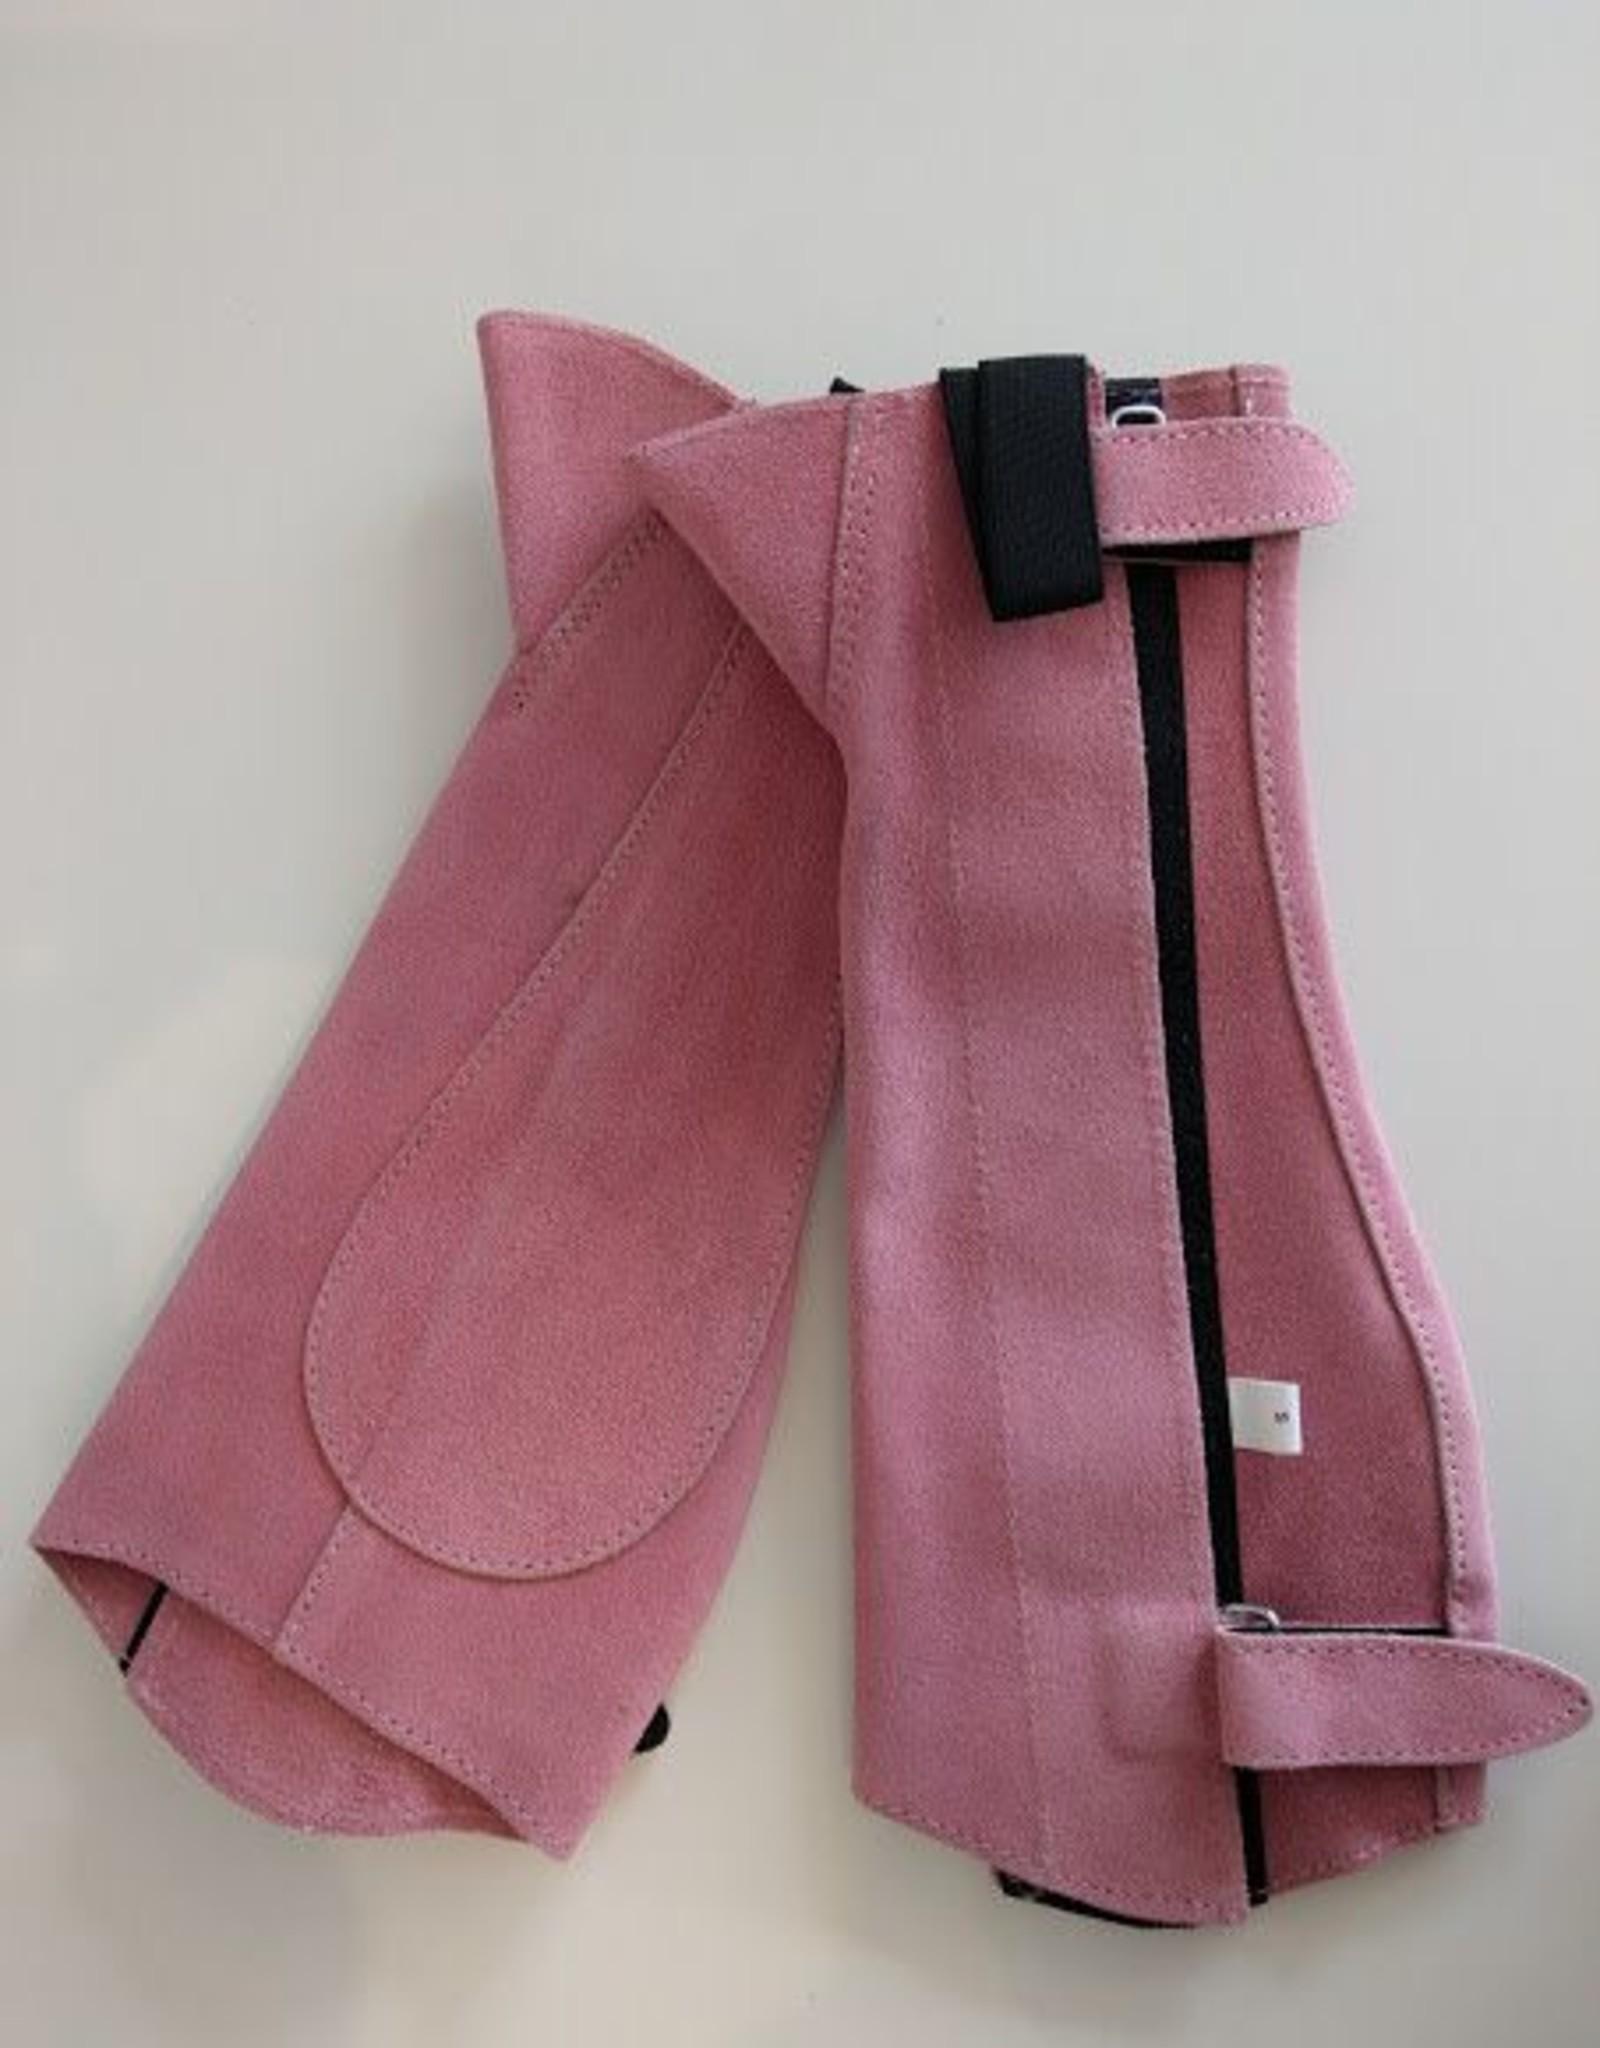 Eureka Suede Chapettes - Pink - Small Kids